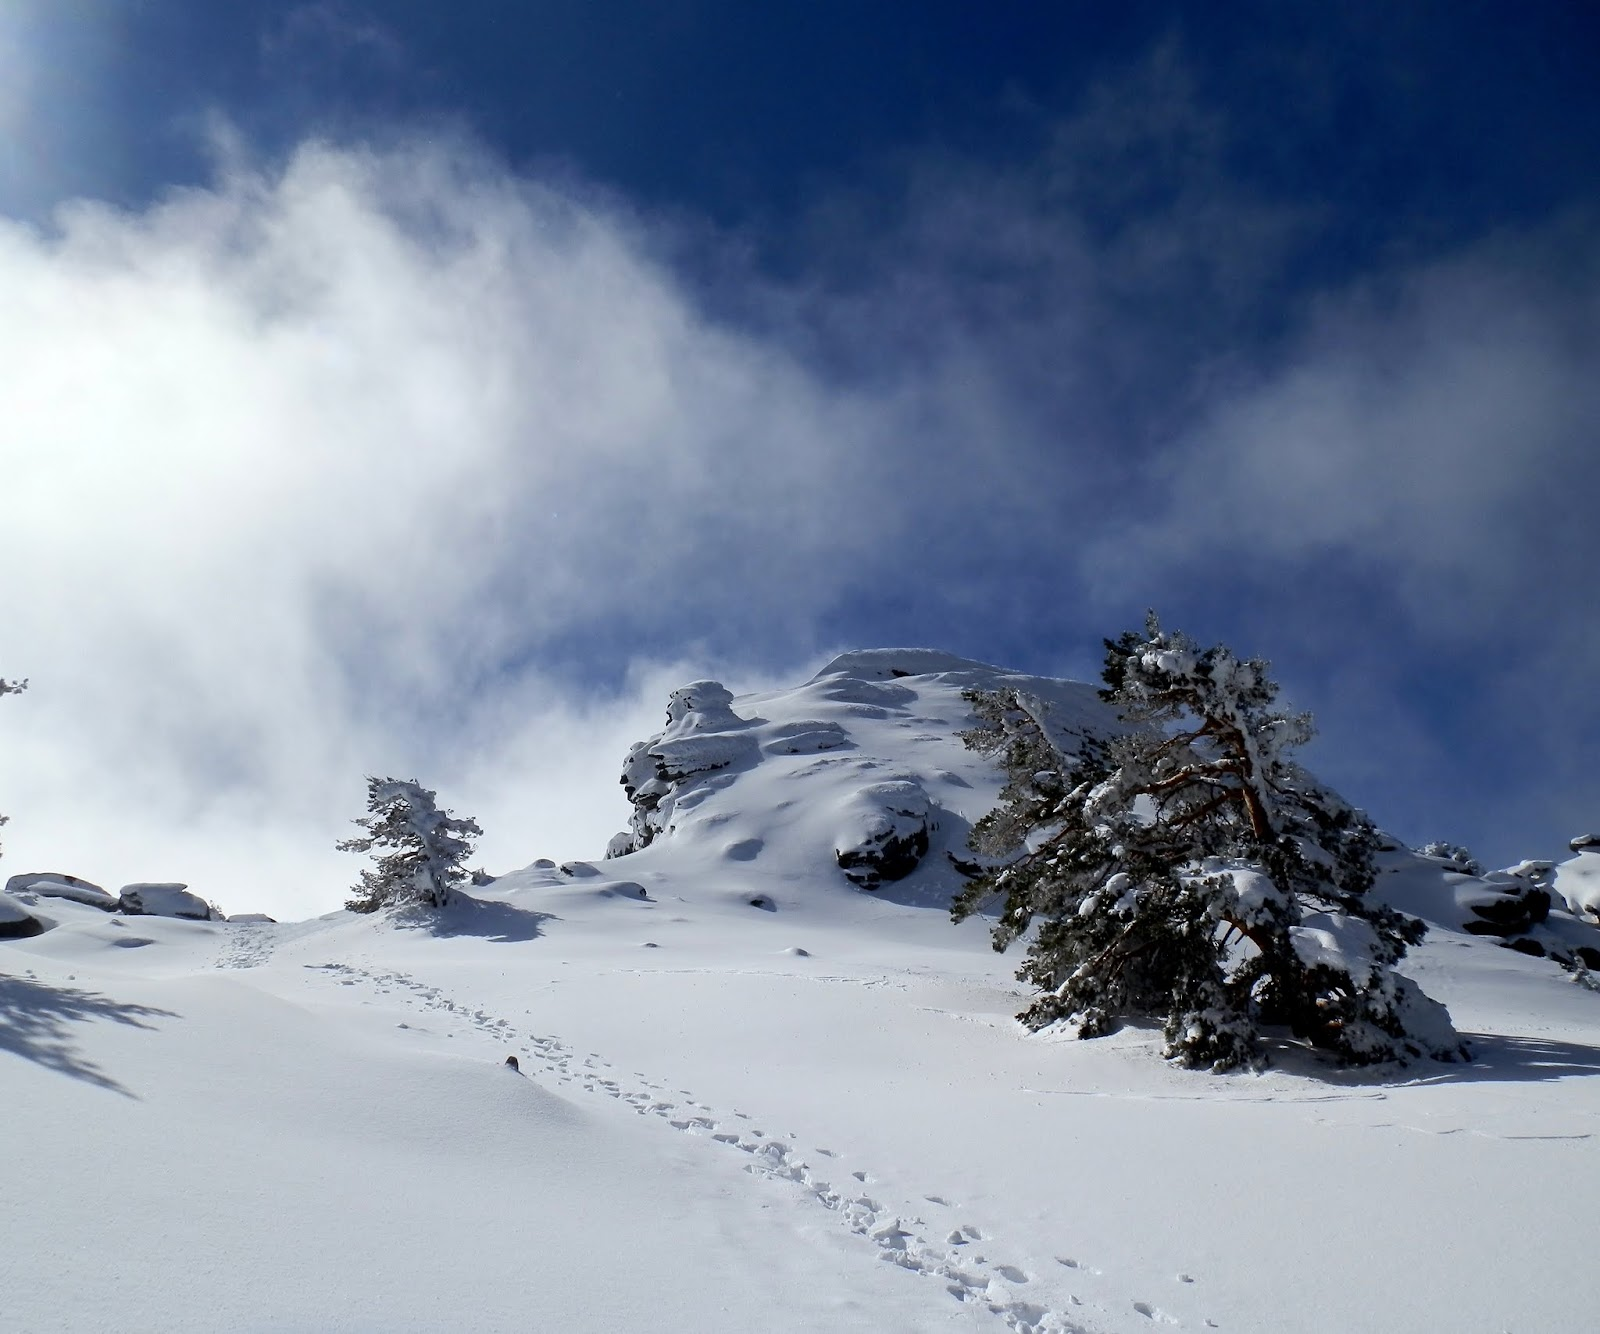 iniciación senderismo Invernal, Siete picos